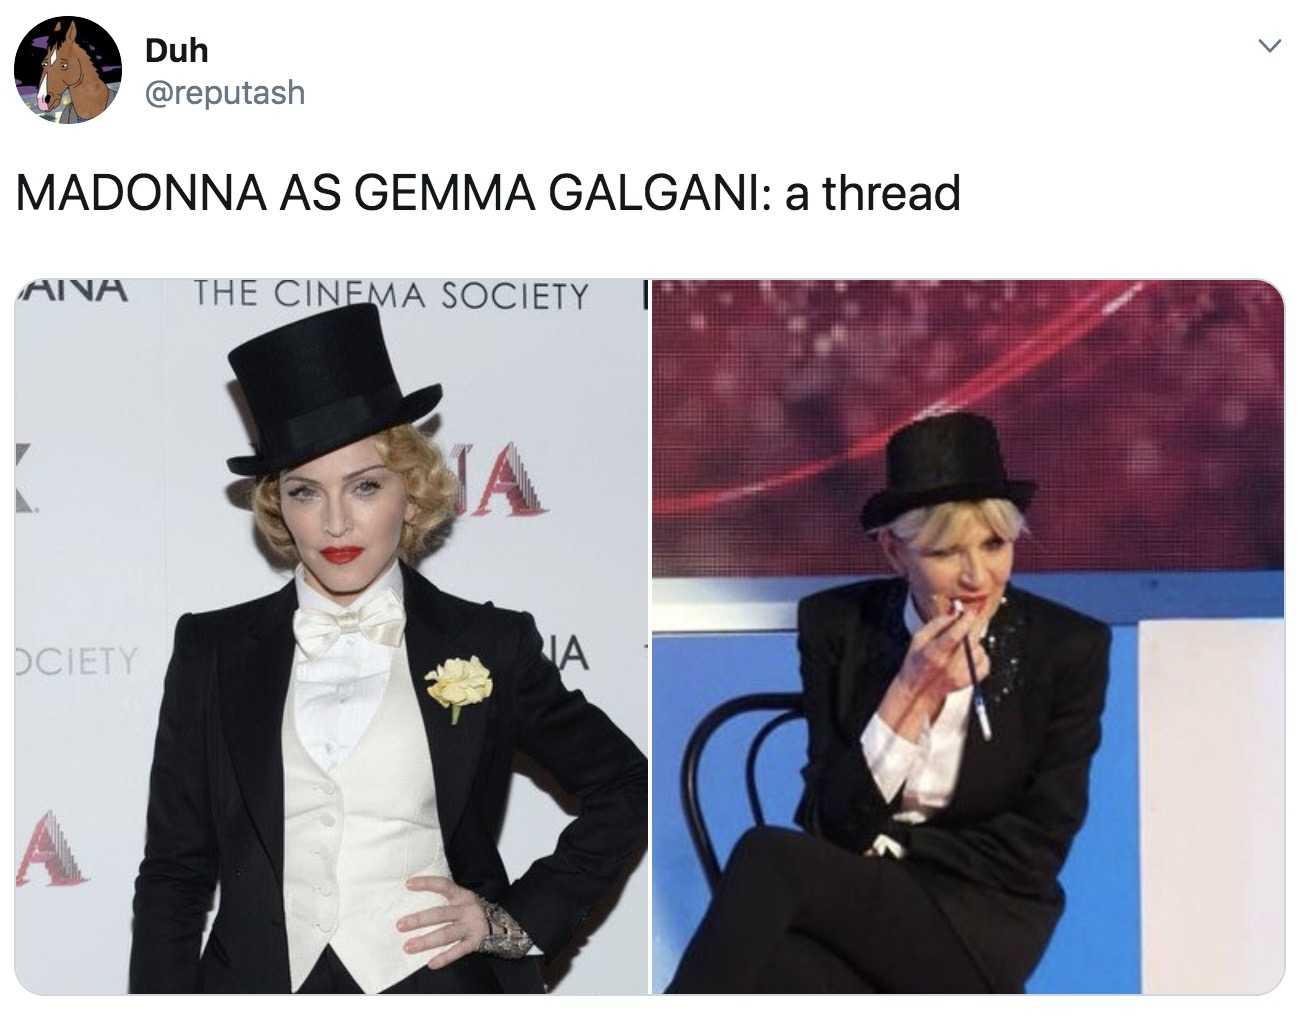 Madonna e Gemma Galgani 2019-07-04 alle 23.38.58